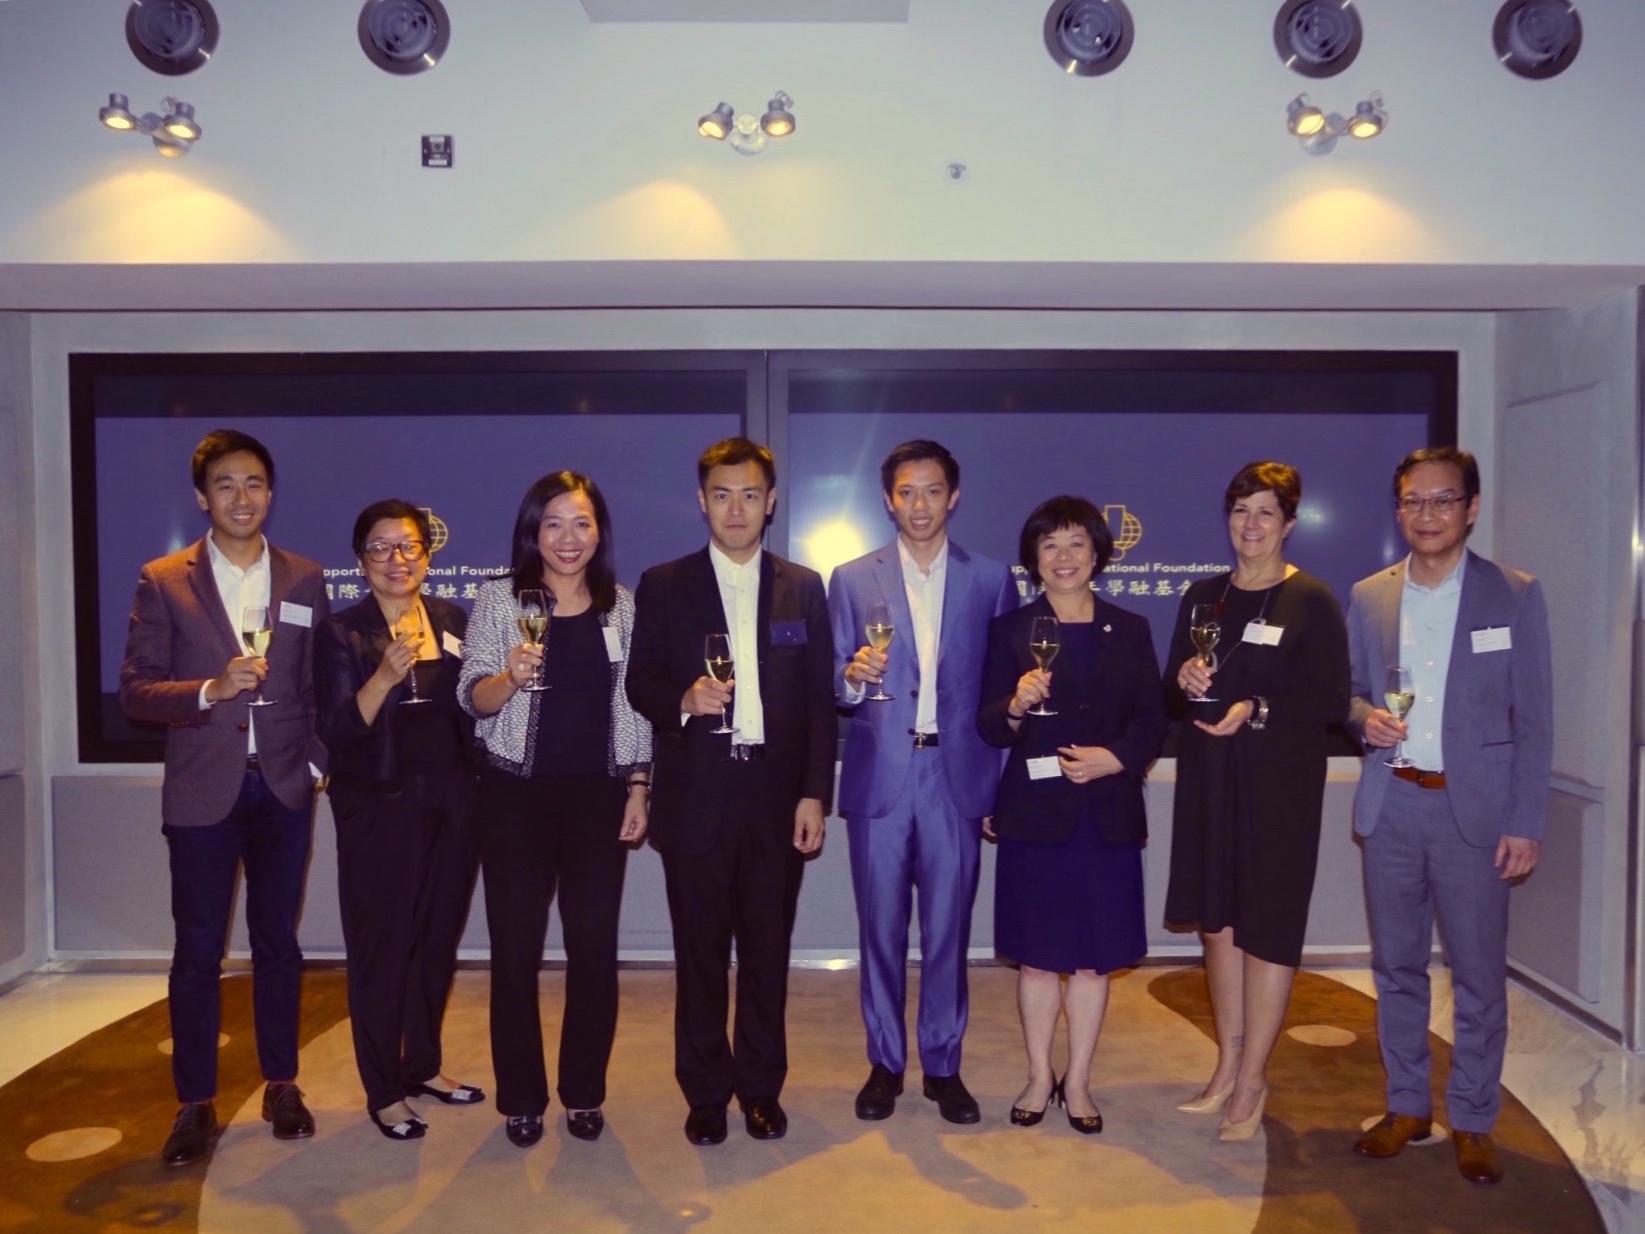 Board of Directors Toast (L-R: Gary Liu, Anna Lo, Jacqueline Lam, Chairman Ming Wai Lau, Founder & President Joseph Wan, Bonnie Ngan, Abigail DeLessio, C S Wai)